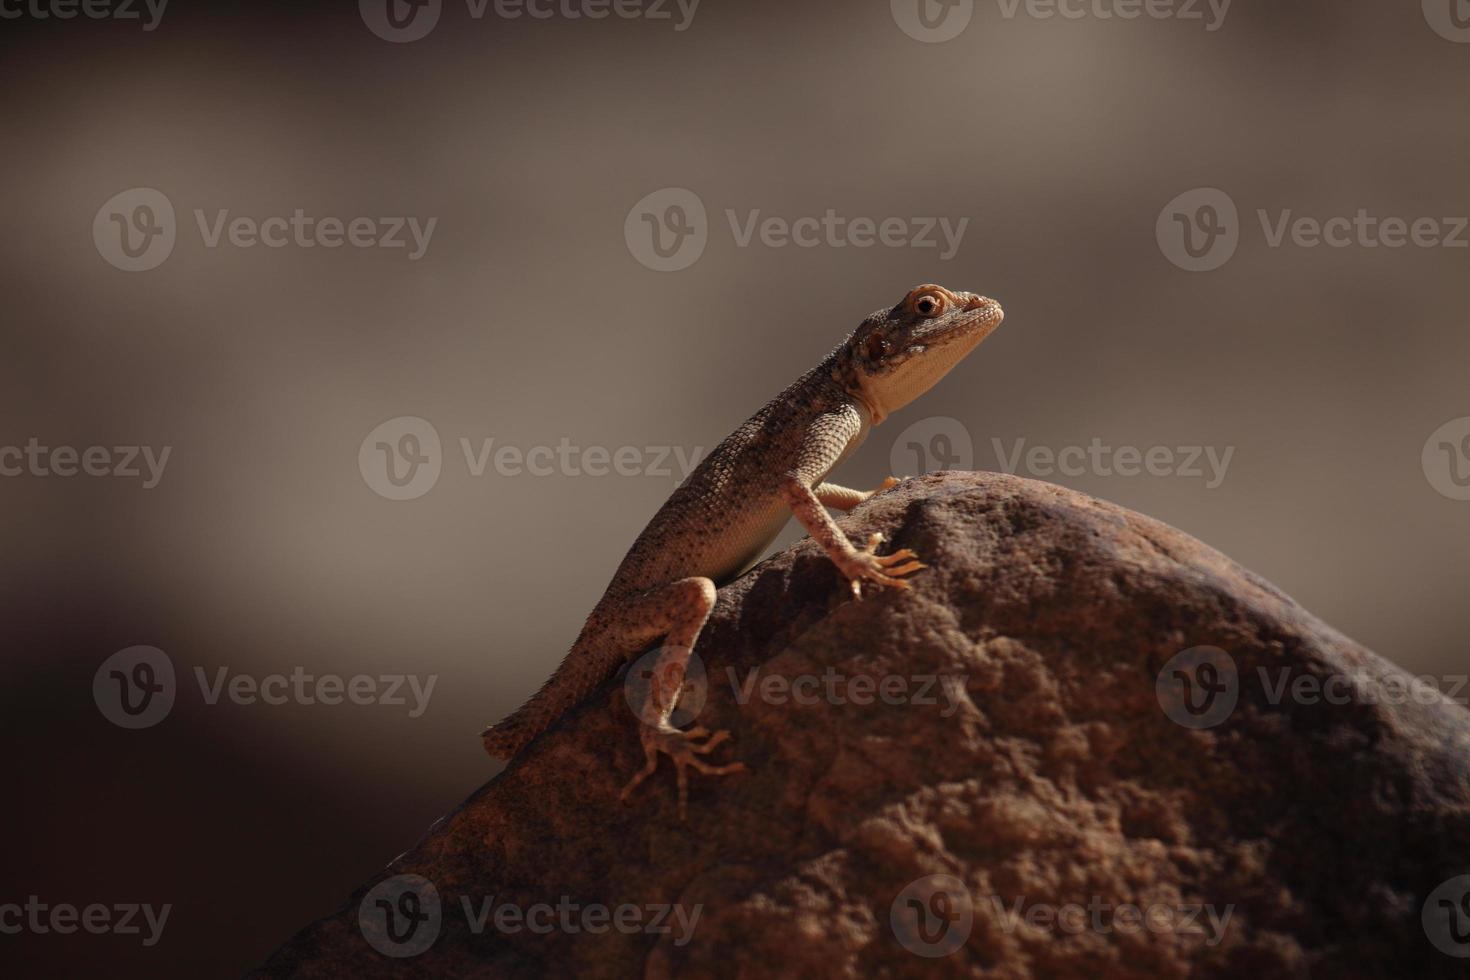 Reptilien in der Sahara photo